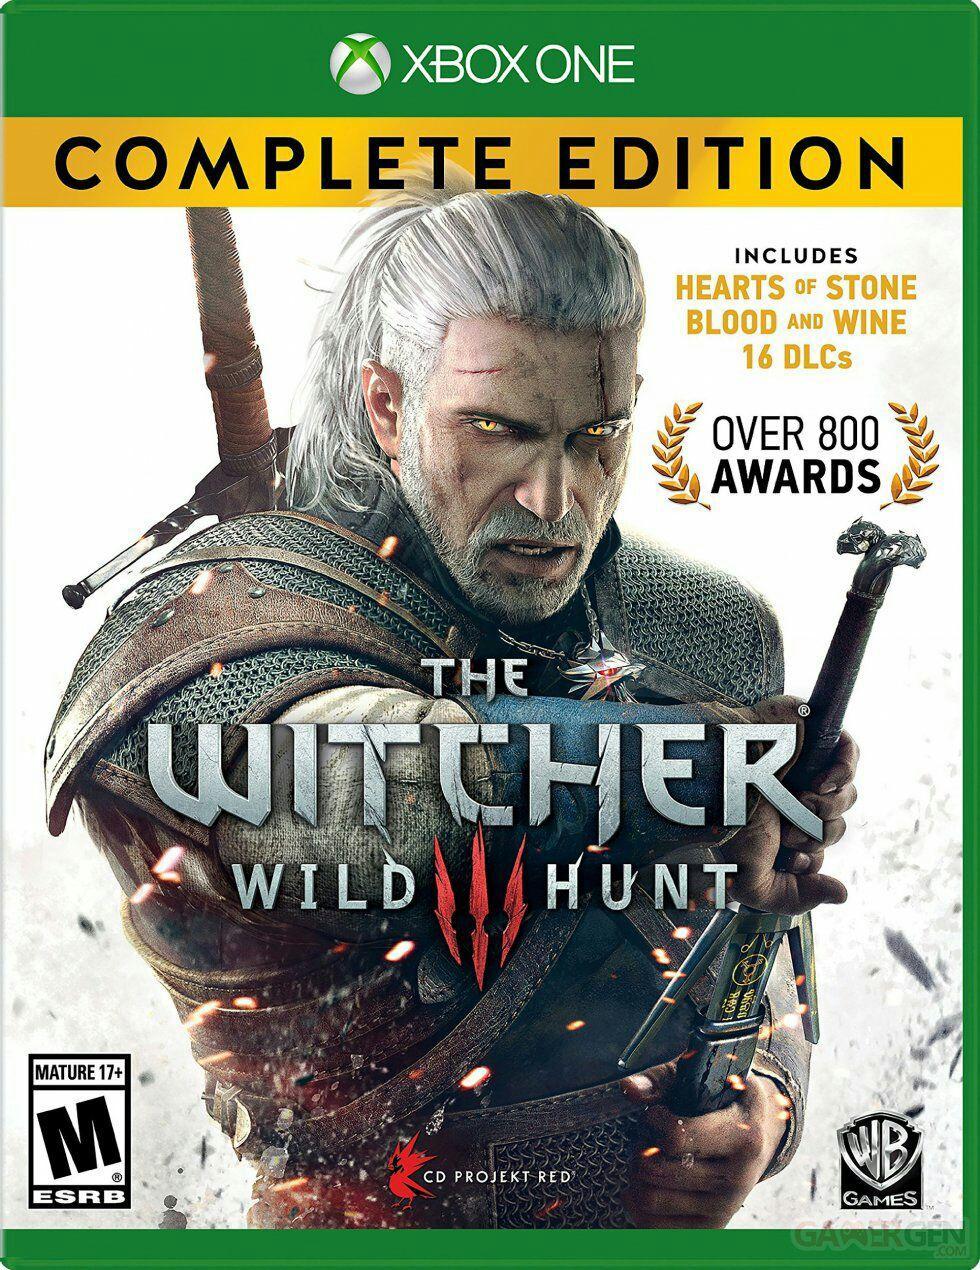 The Witcher 3: Wild Hunt GOTY sur Xbox One et PS4